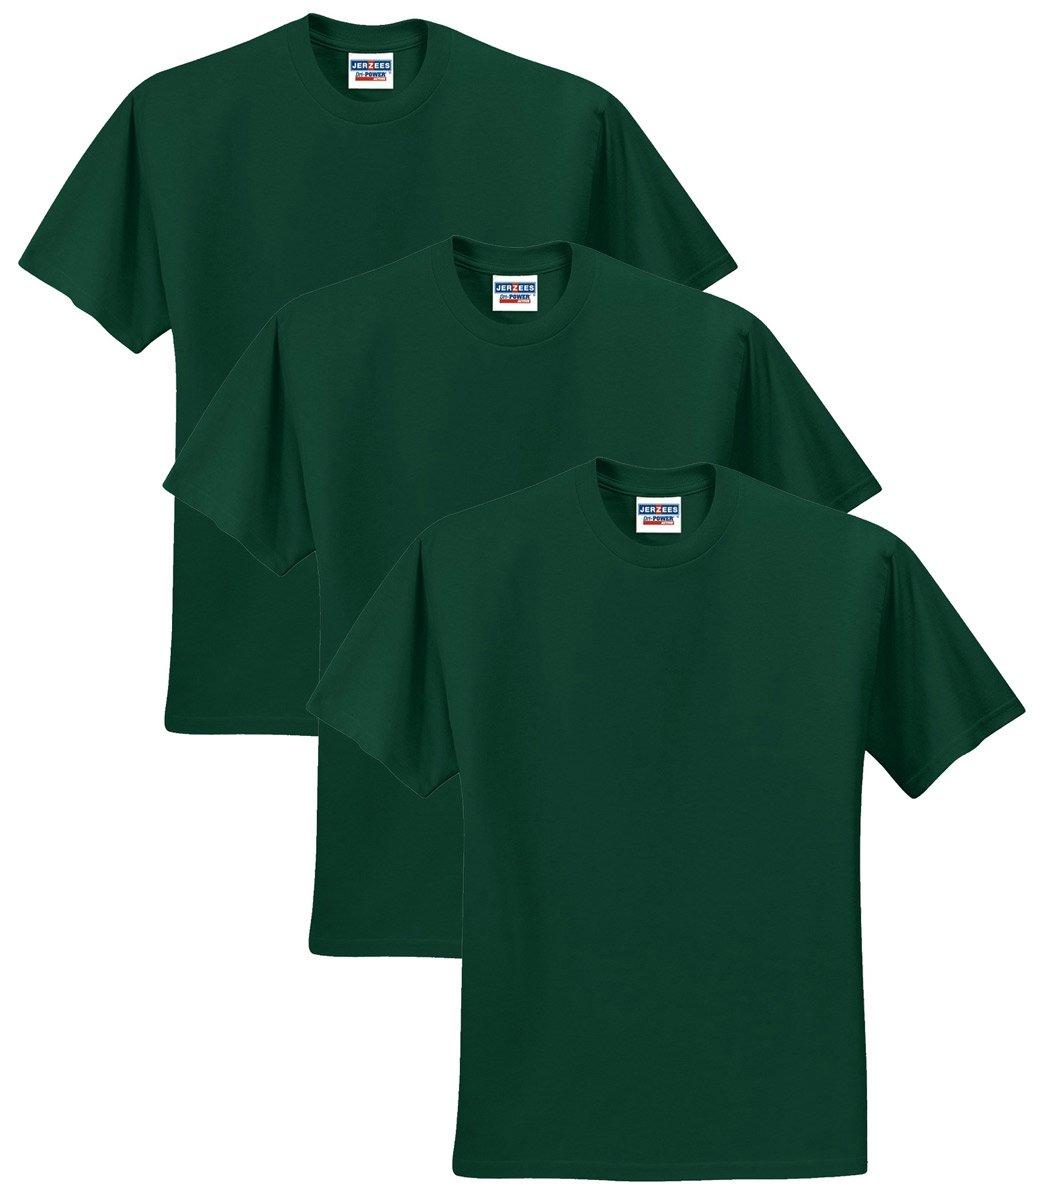 Jerzees メンズ 大人用 半袖Tシャツ(3枚組) B01CZYJXFQ M|フォレストグリーン フォレストグリーン M